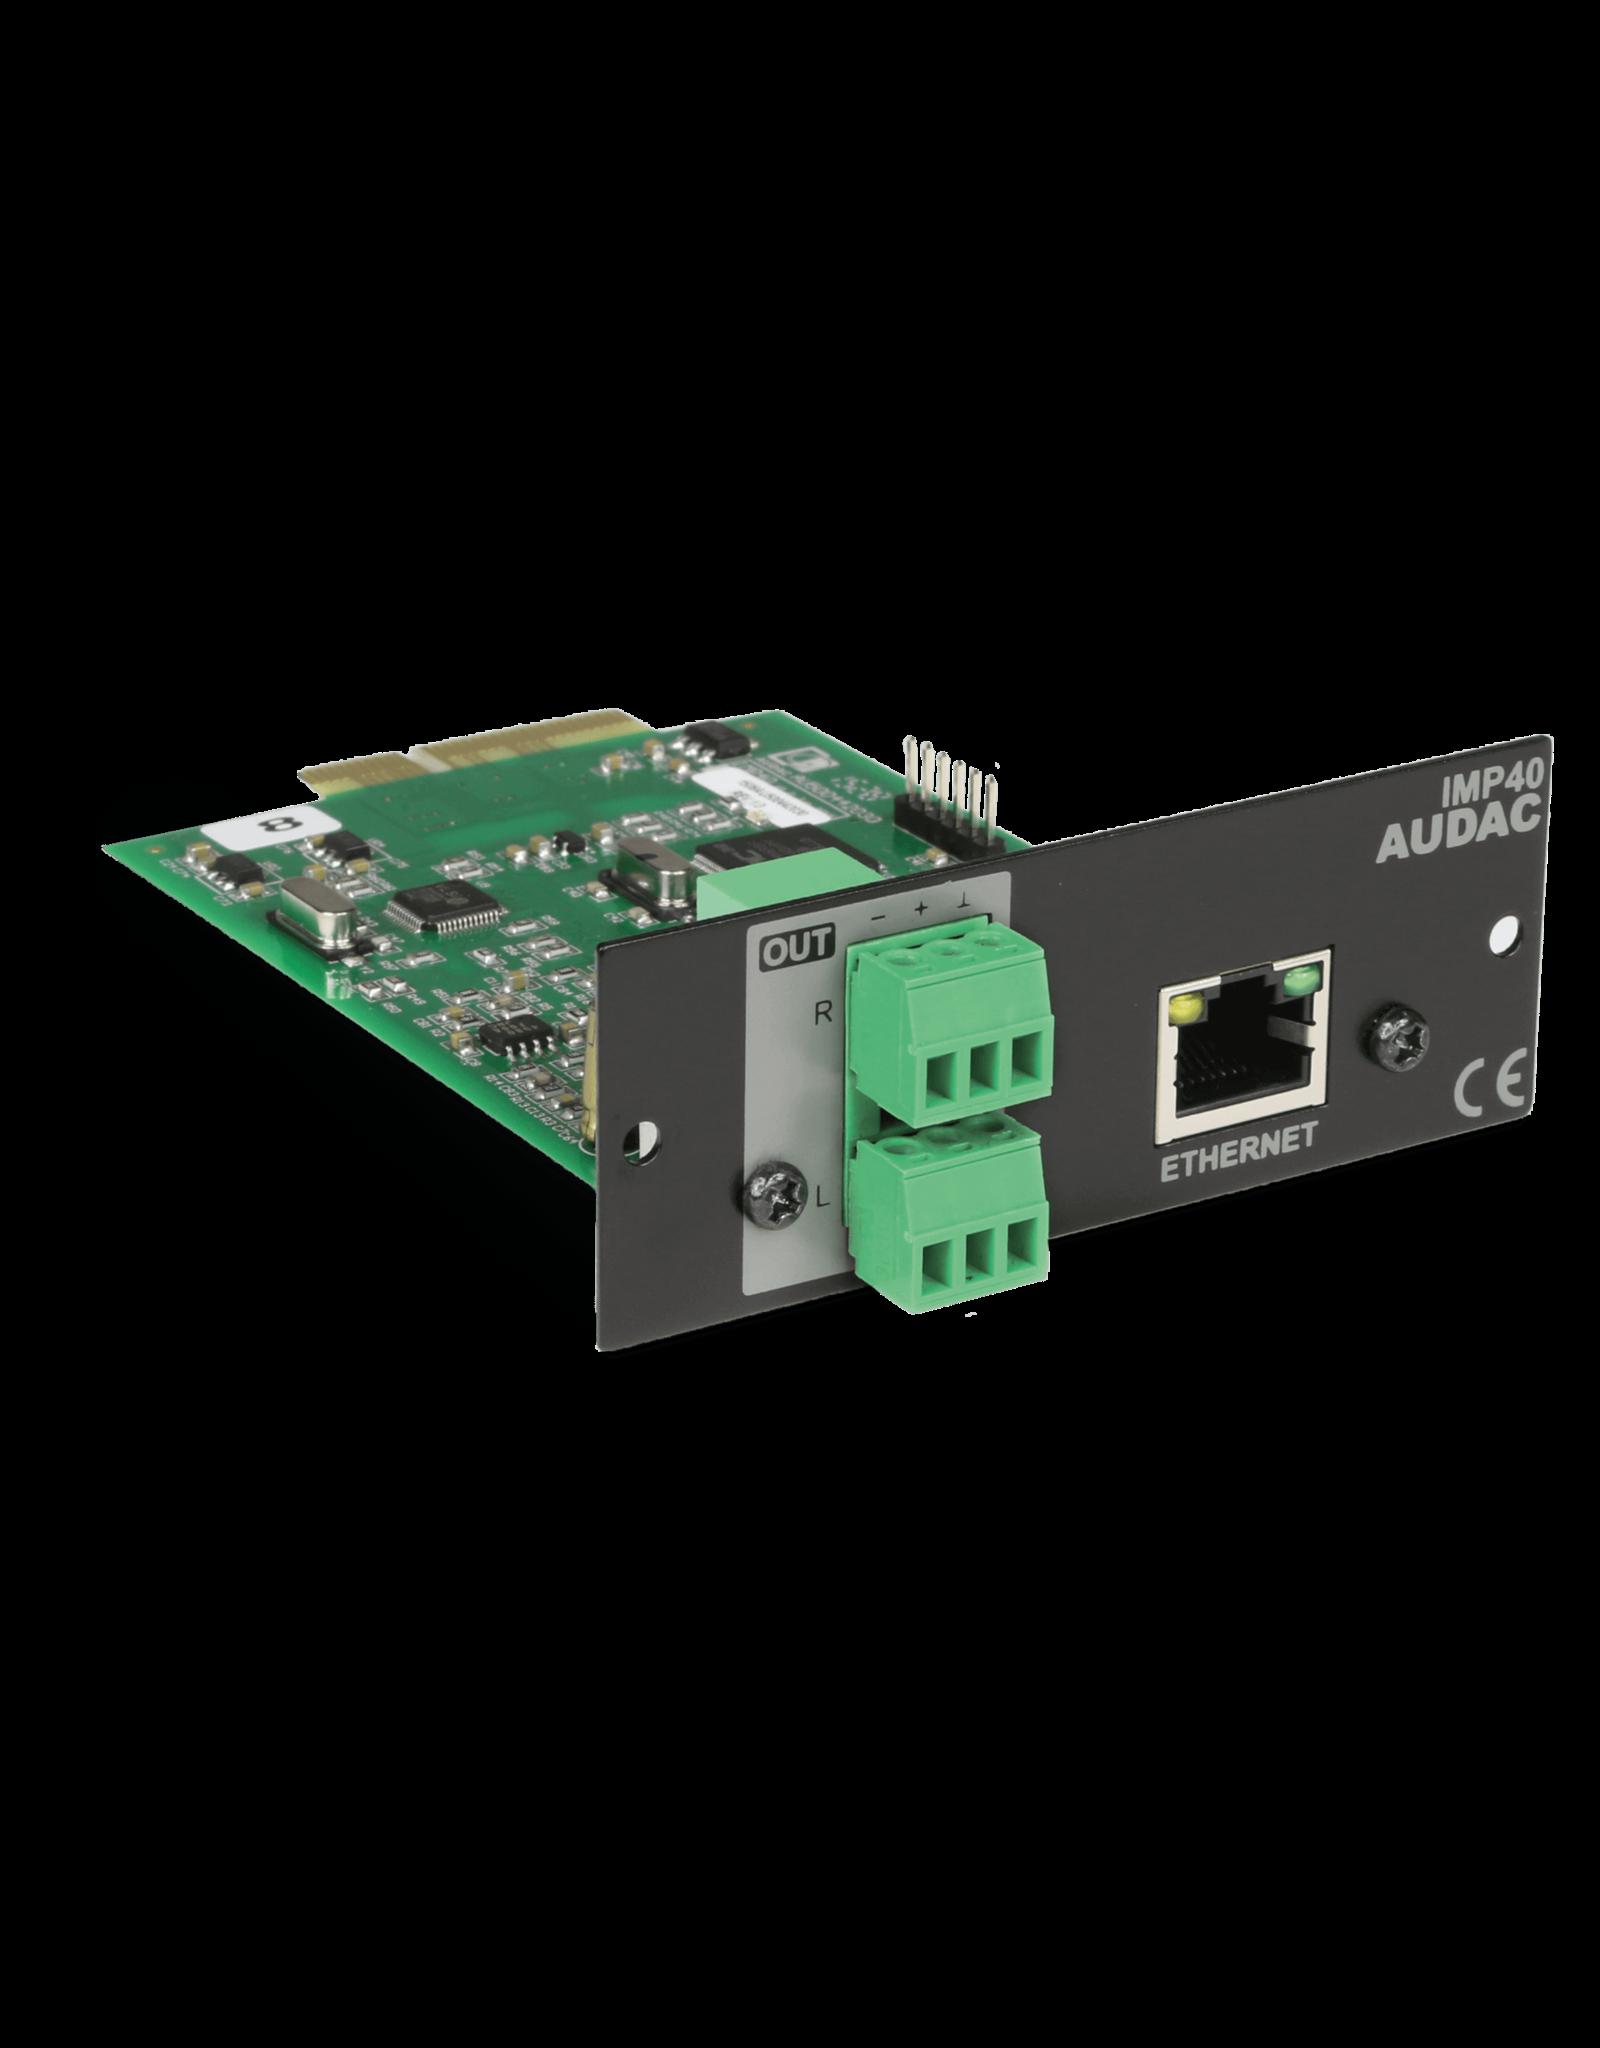 Audac SourceCon™ internet audio player module